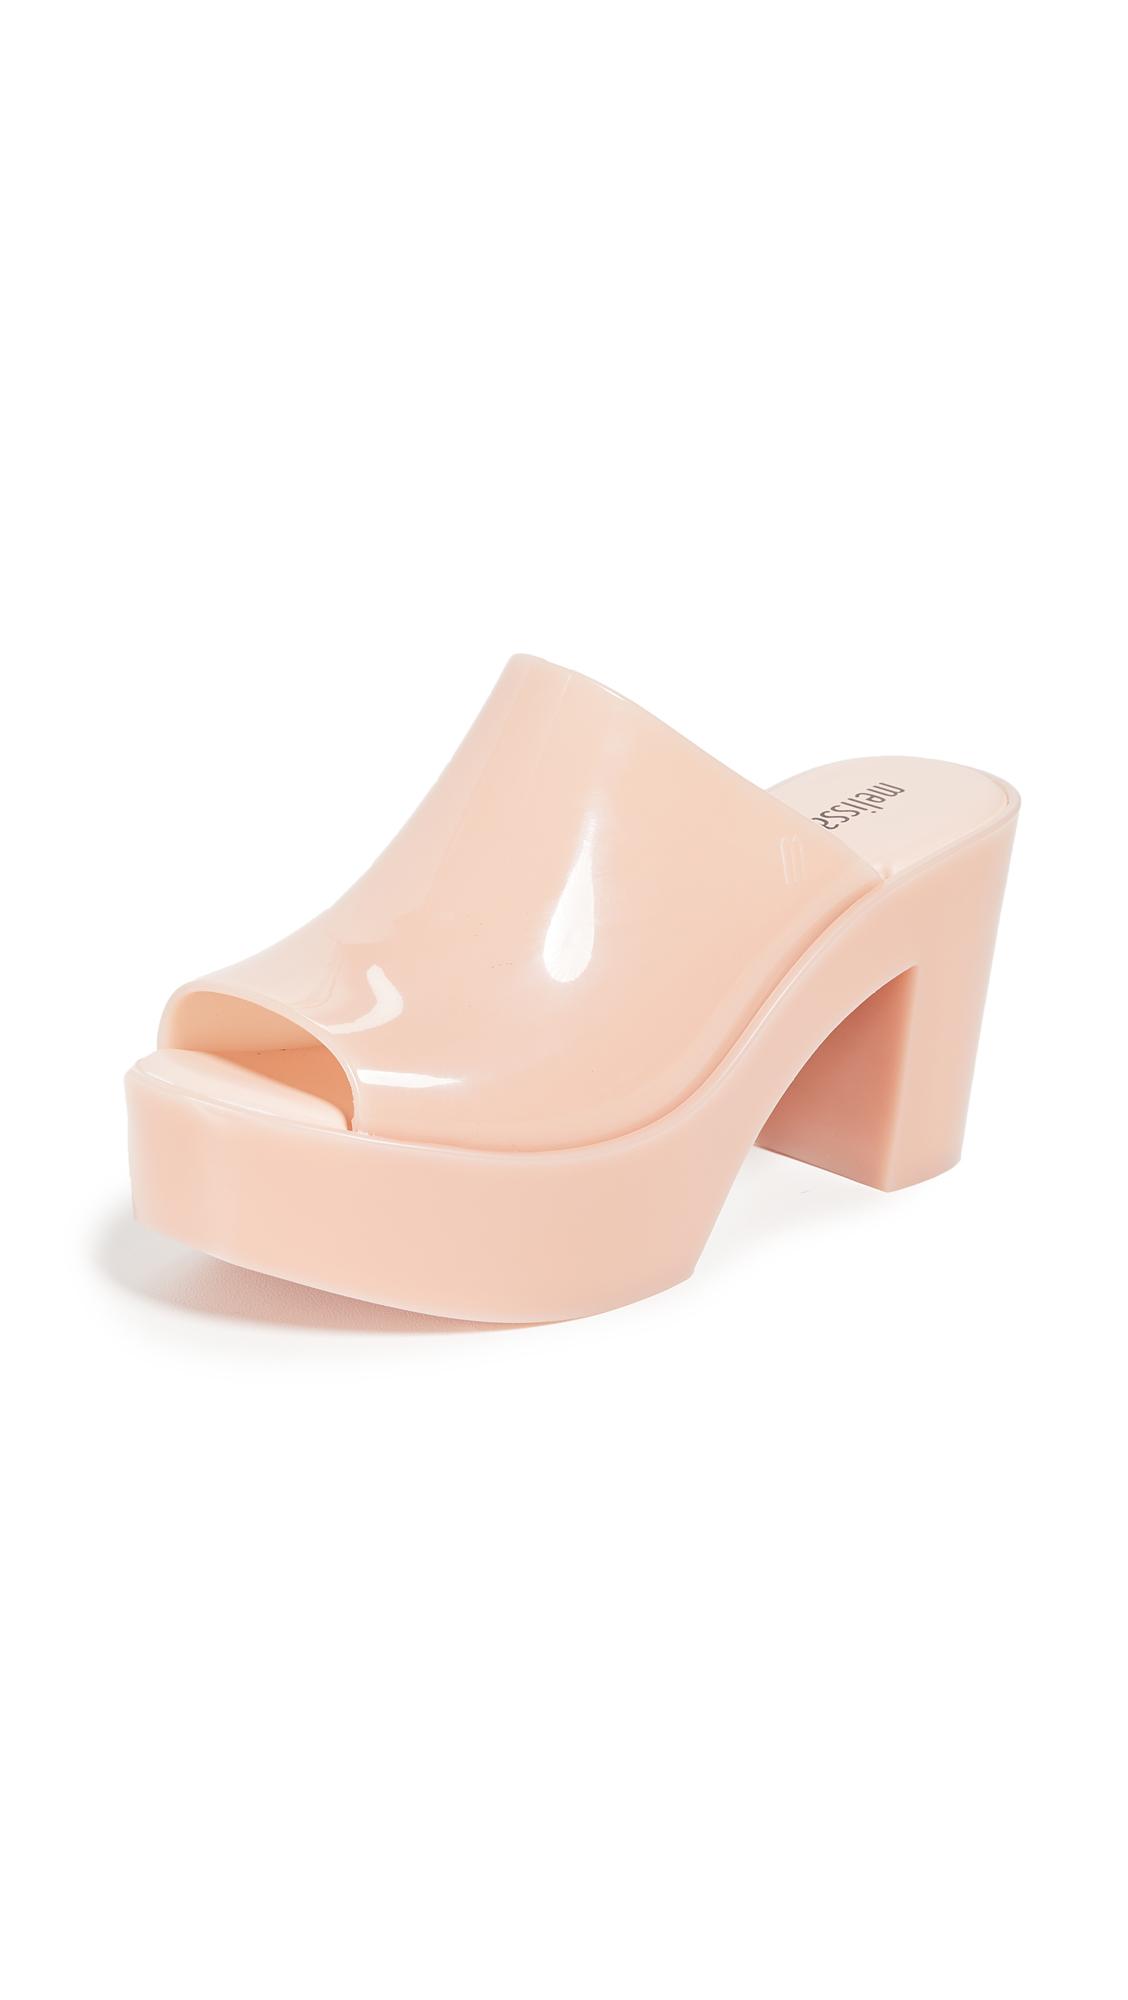 Melissa Platform Mule Sandals